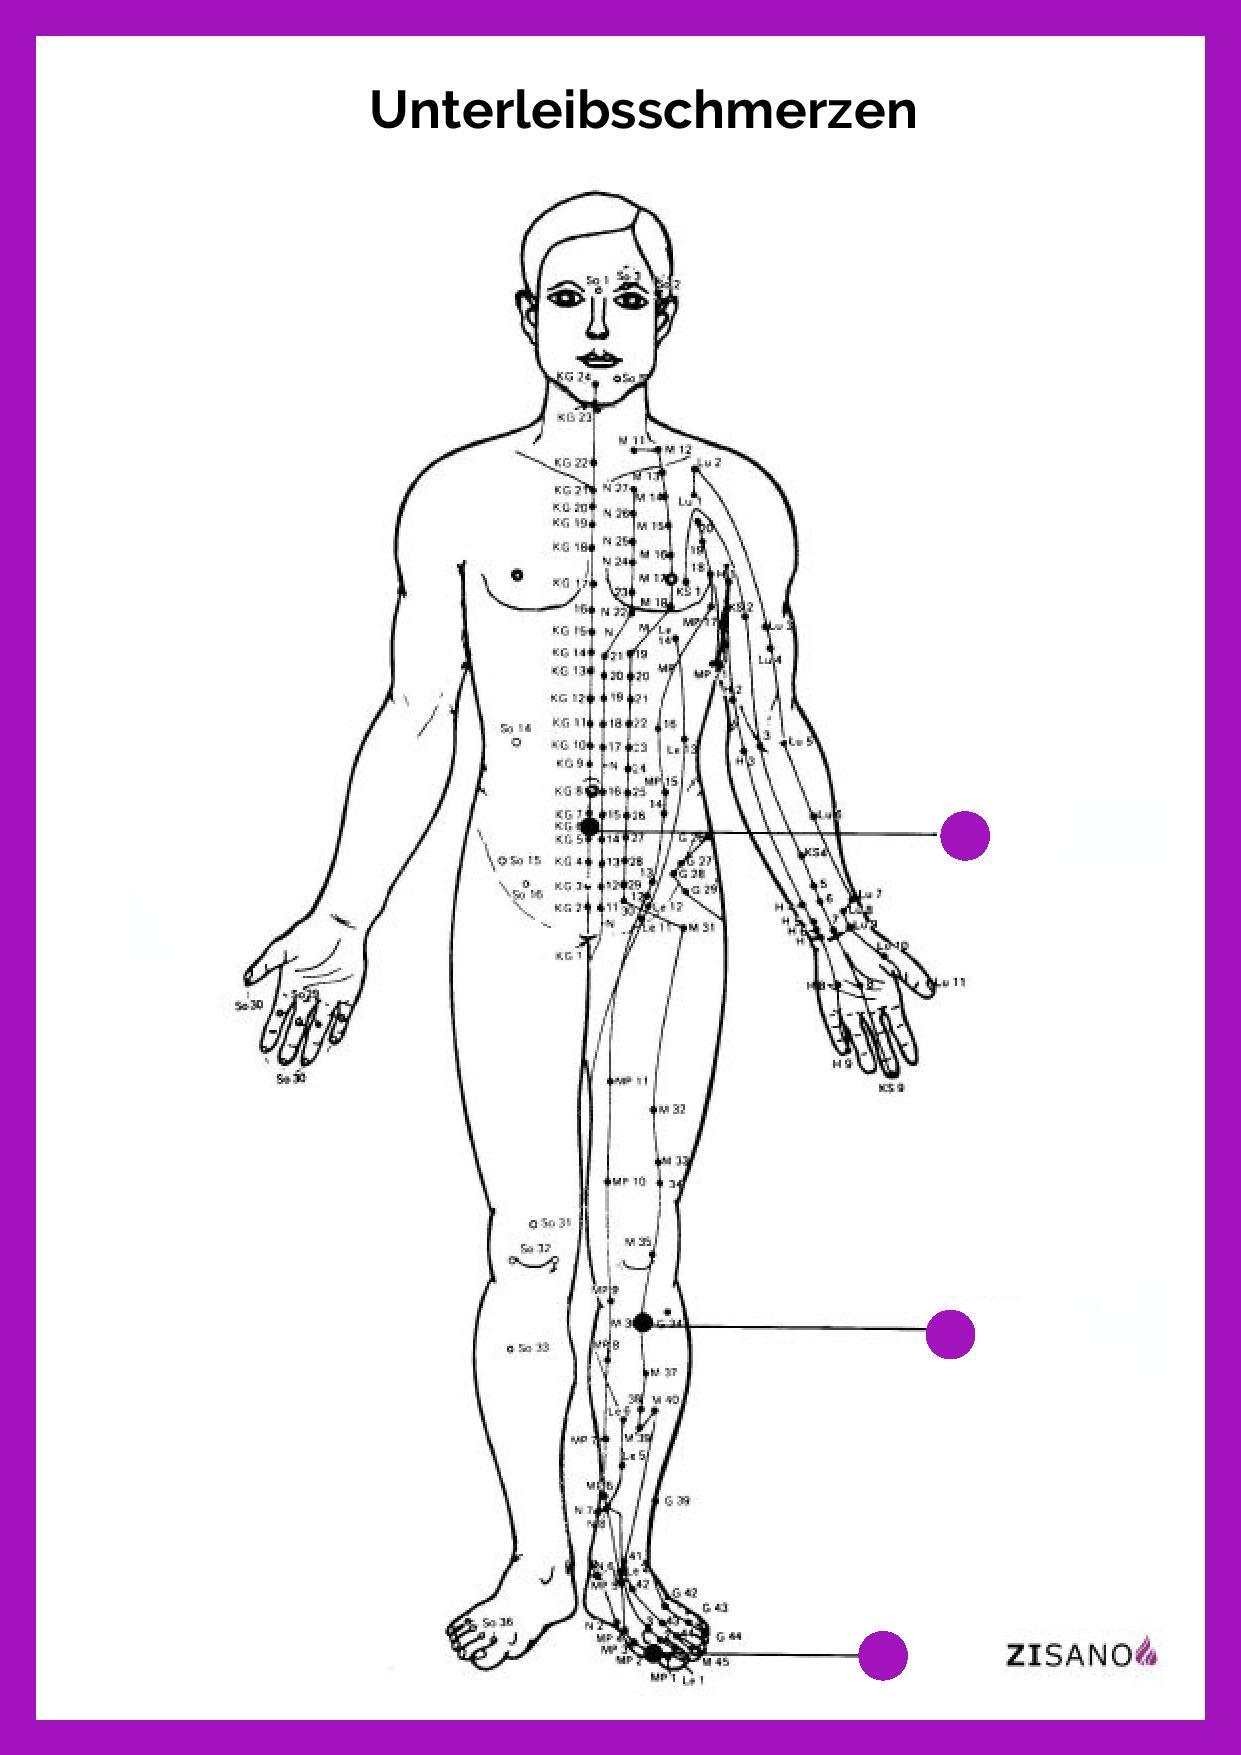 Meridiane - Unterleibsschmerzen - Beschwerden